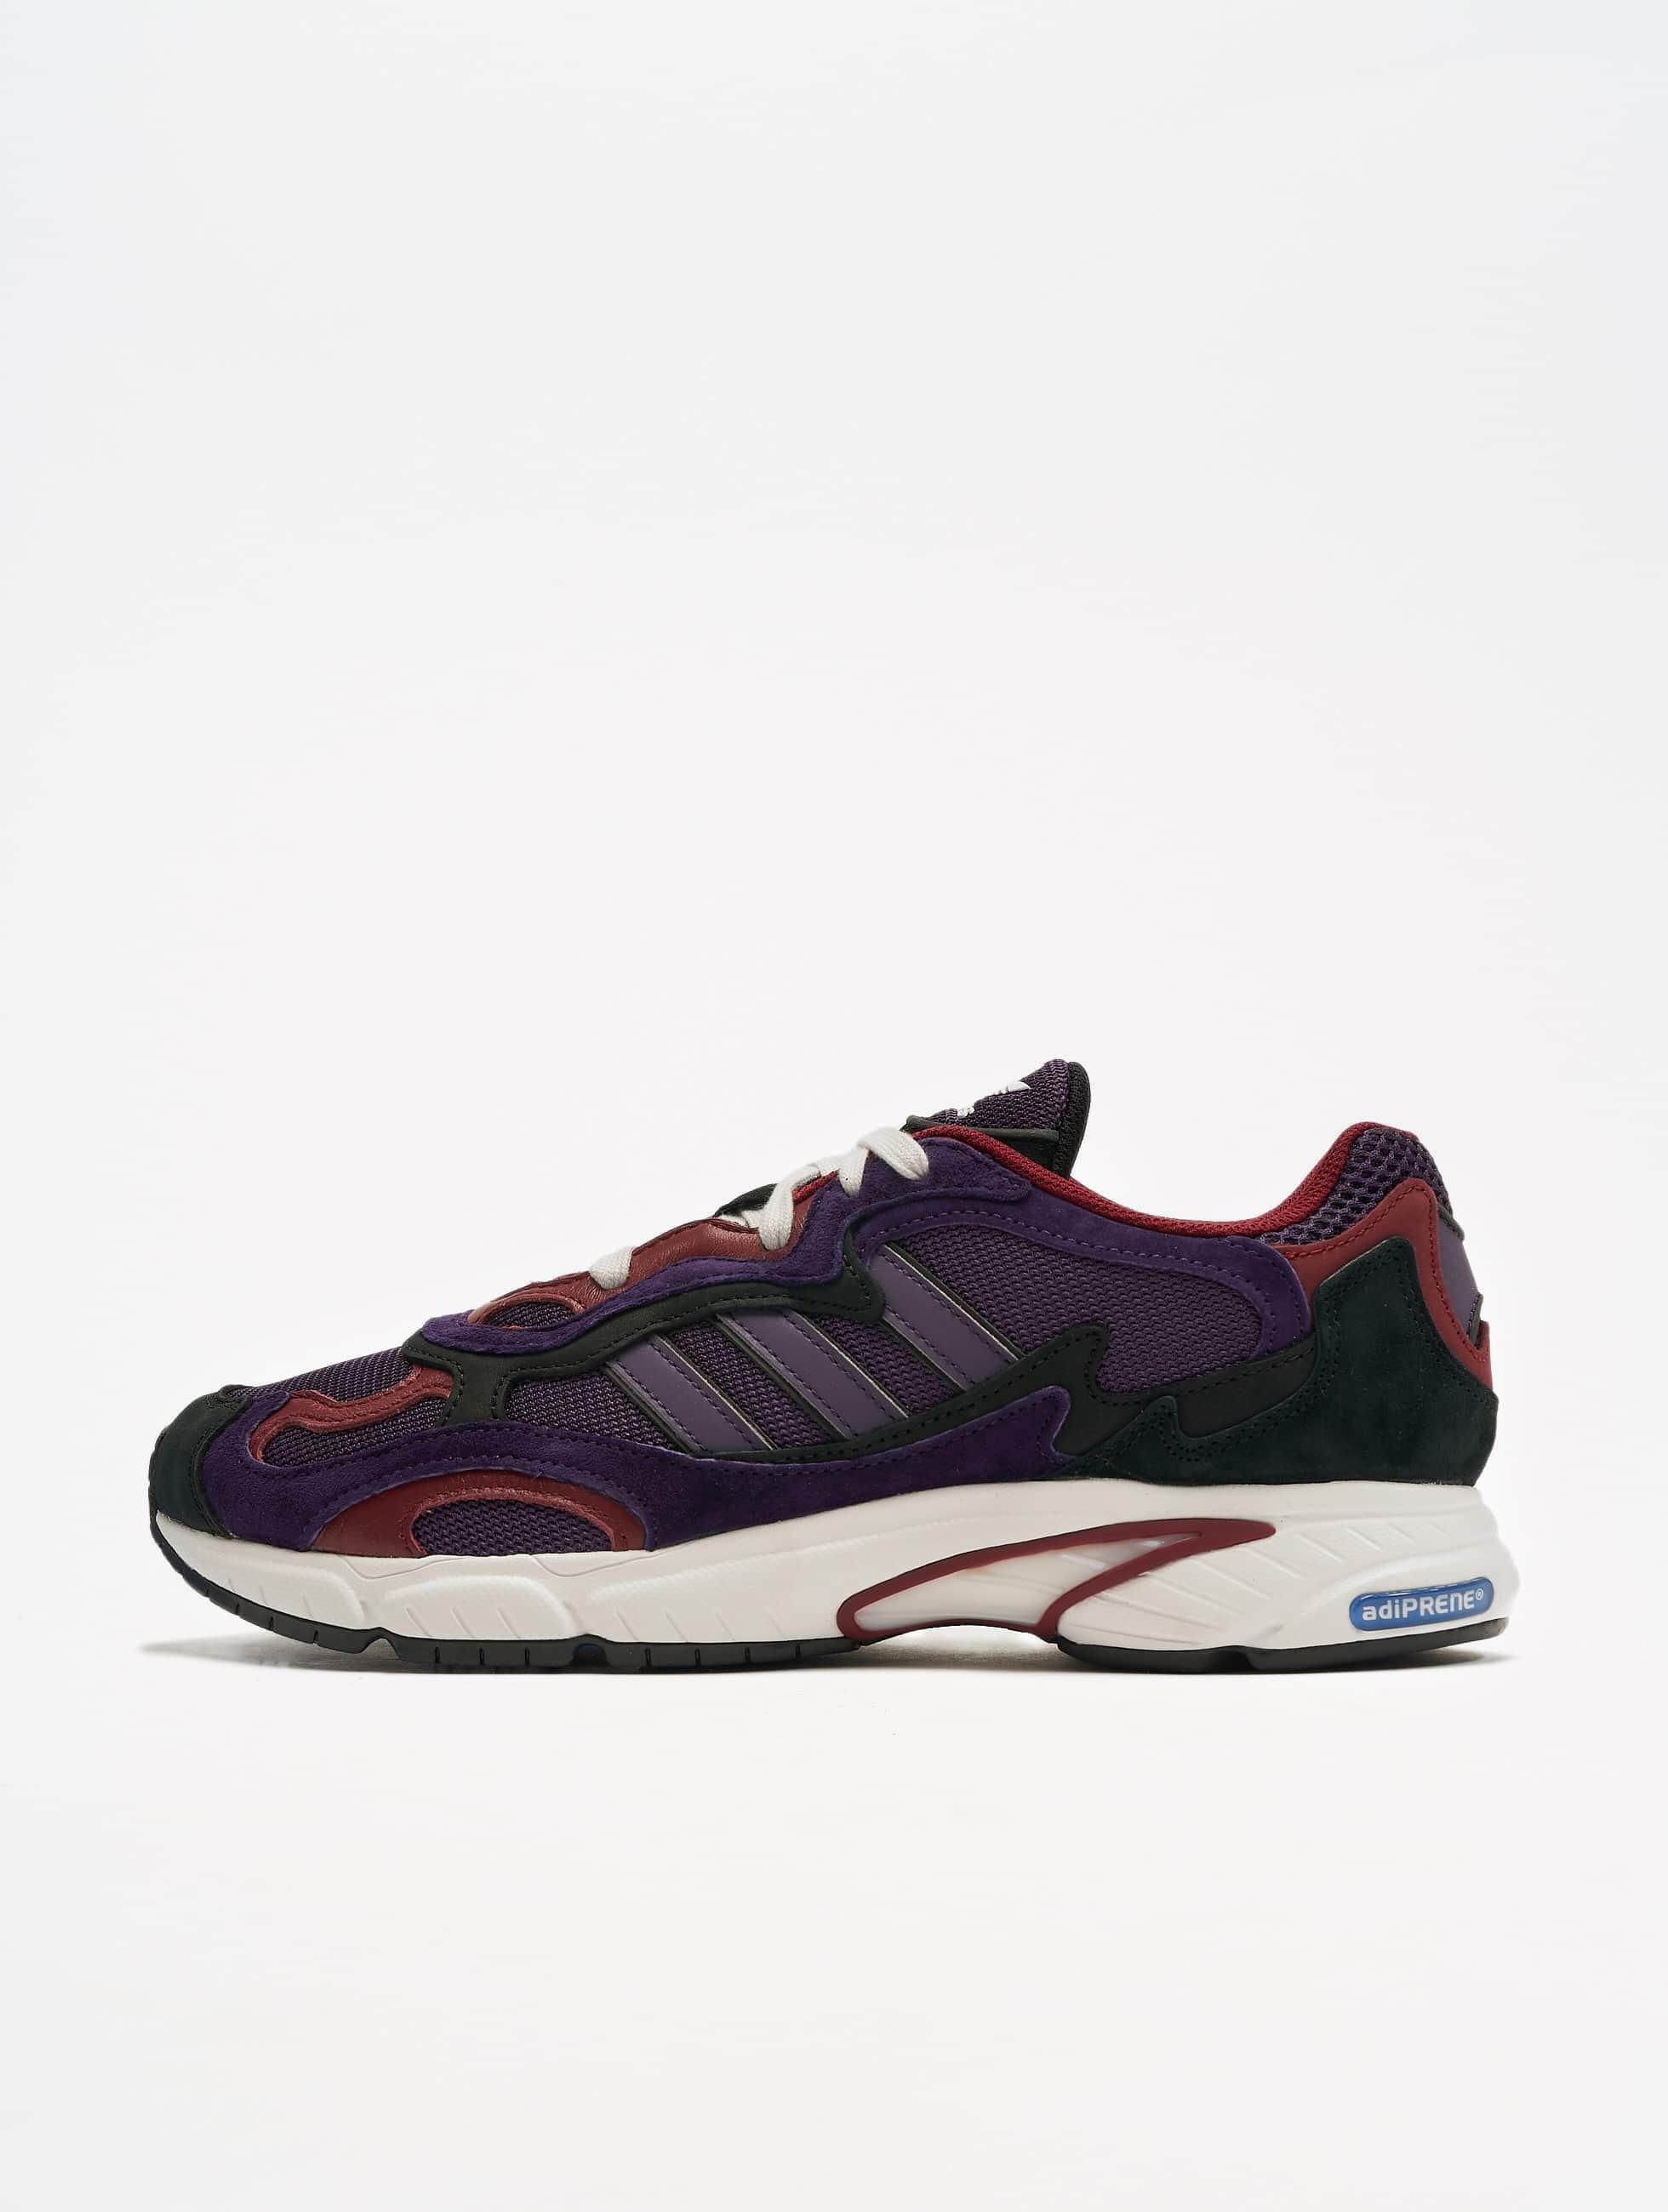 Adidas Originals Temper Run Sneakers LegpurLegpurCblack